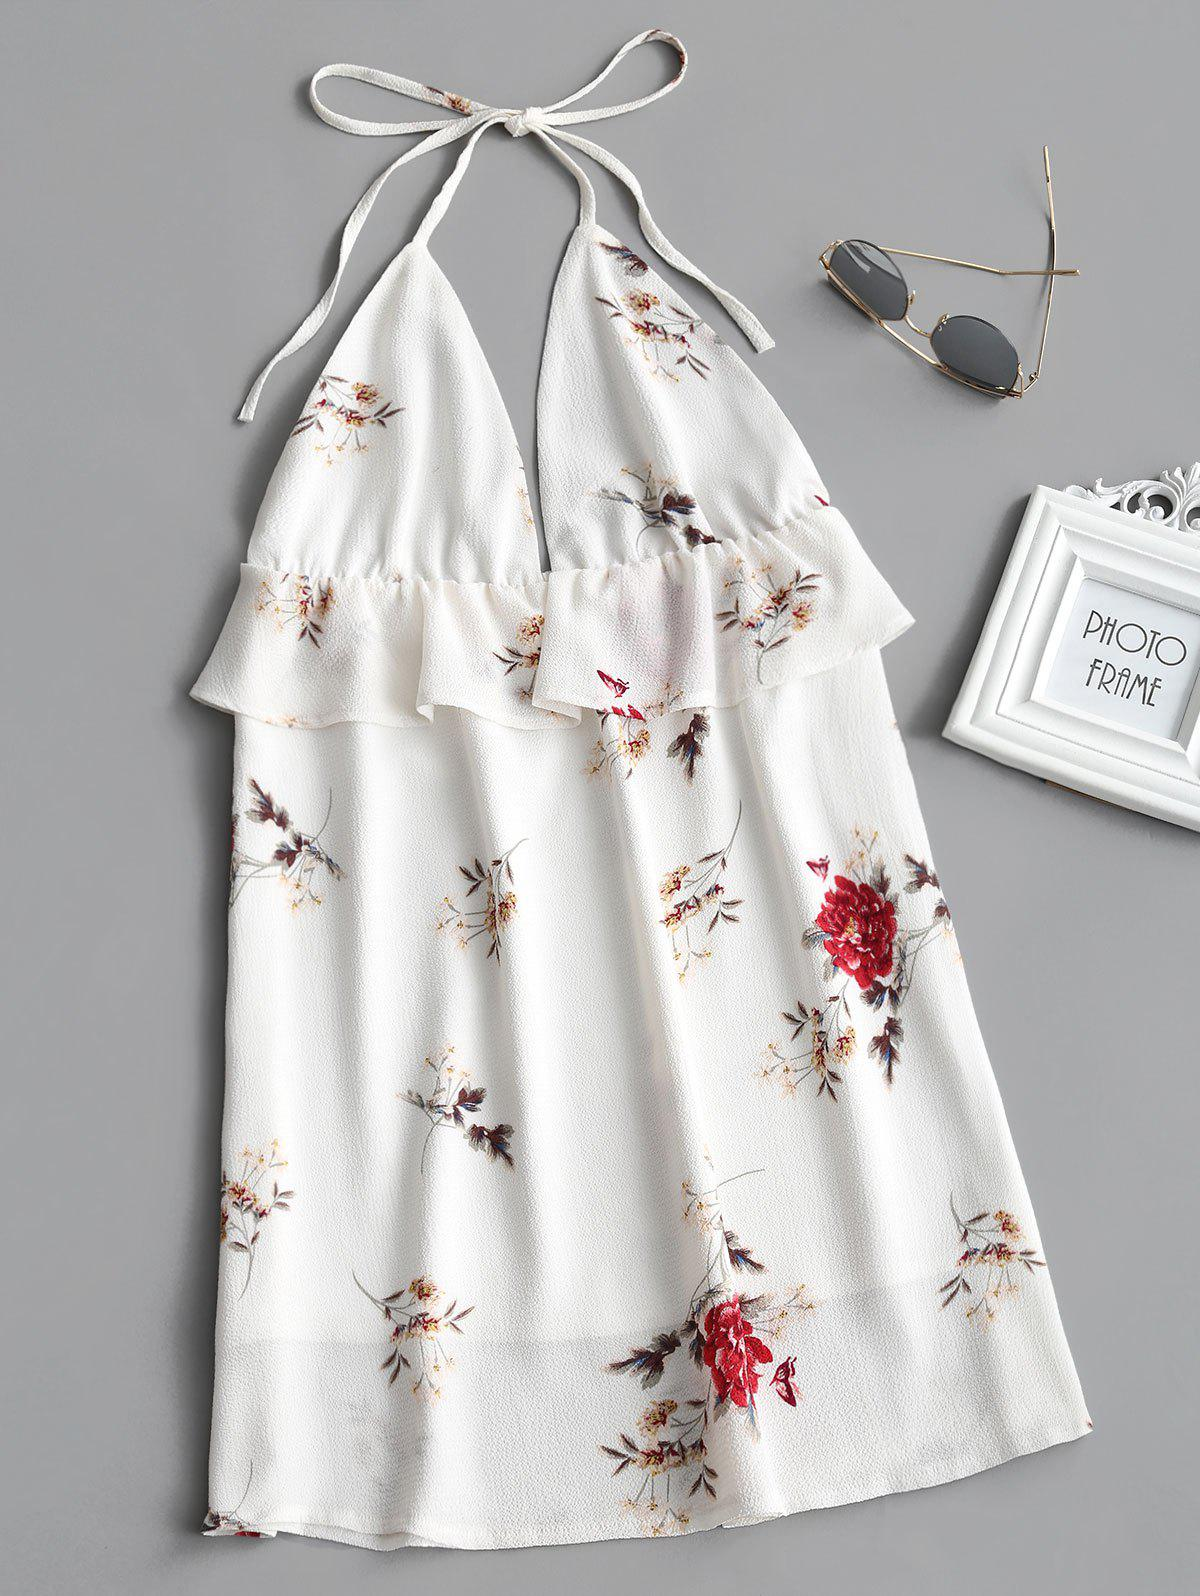 Floral Print Flounce Backless Halter Dress 244058702